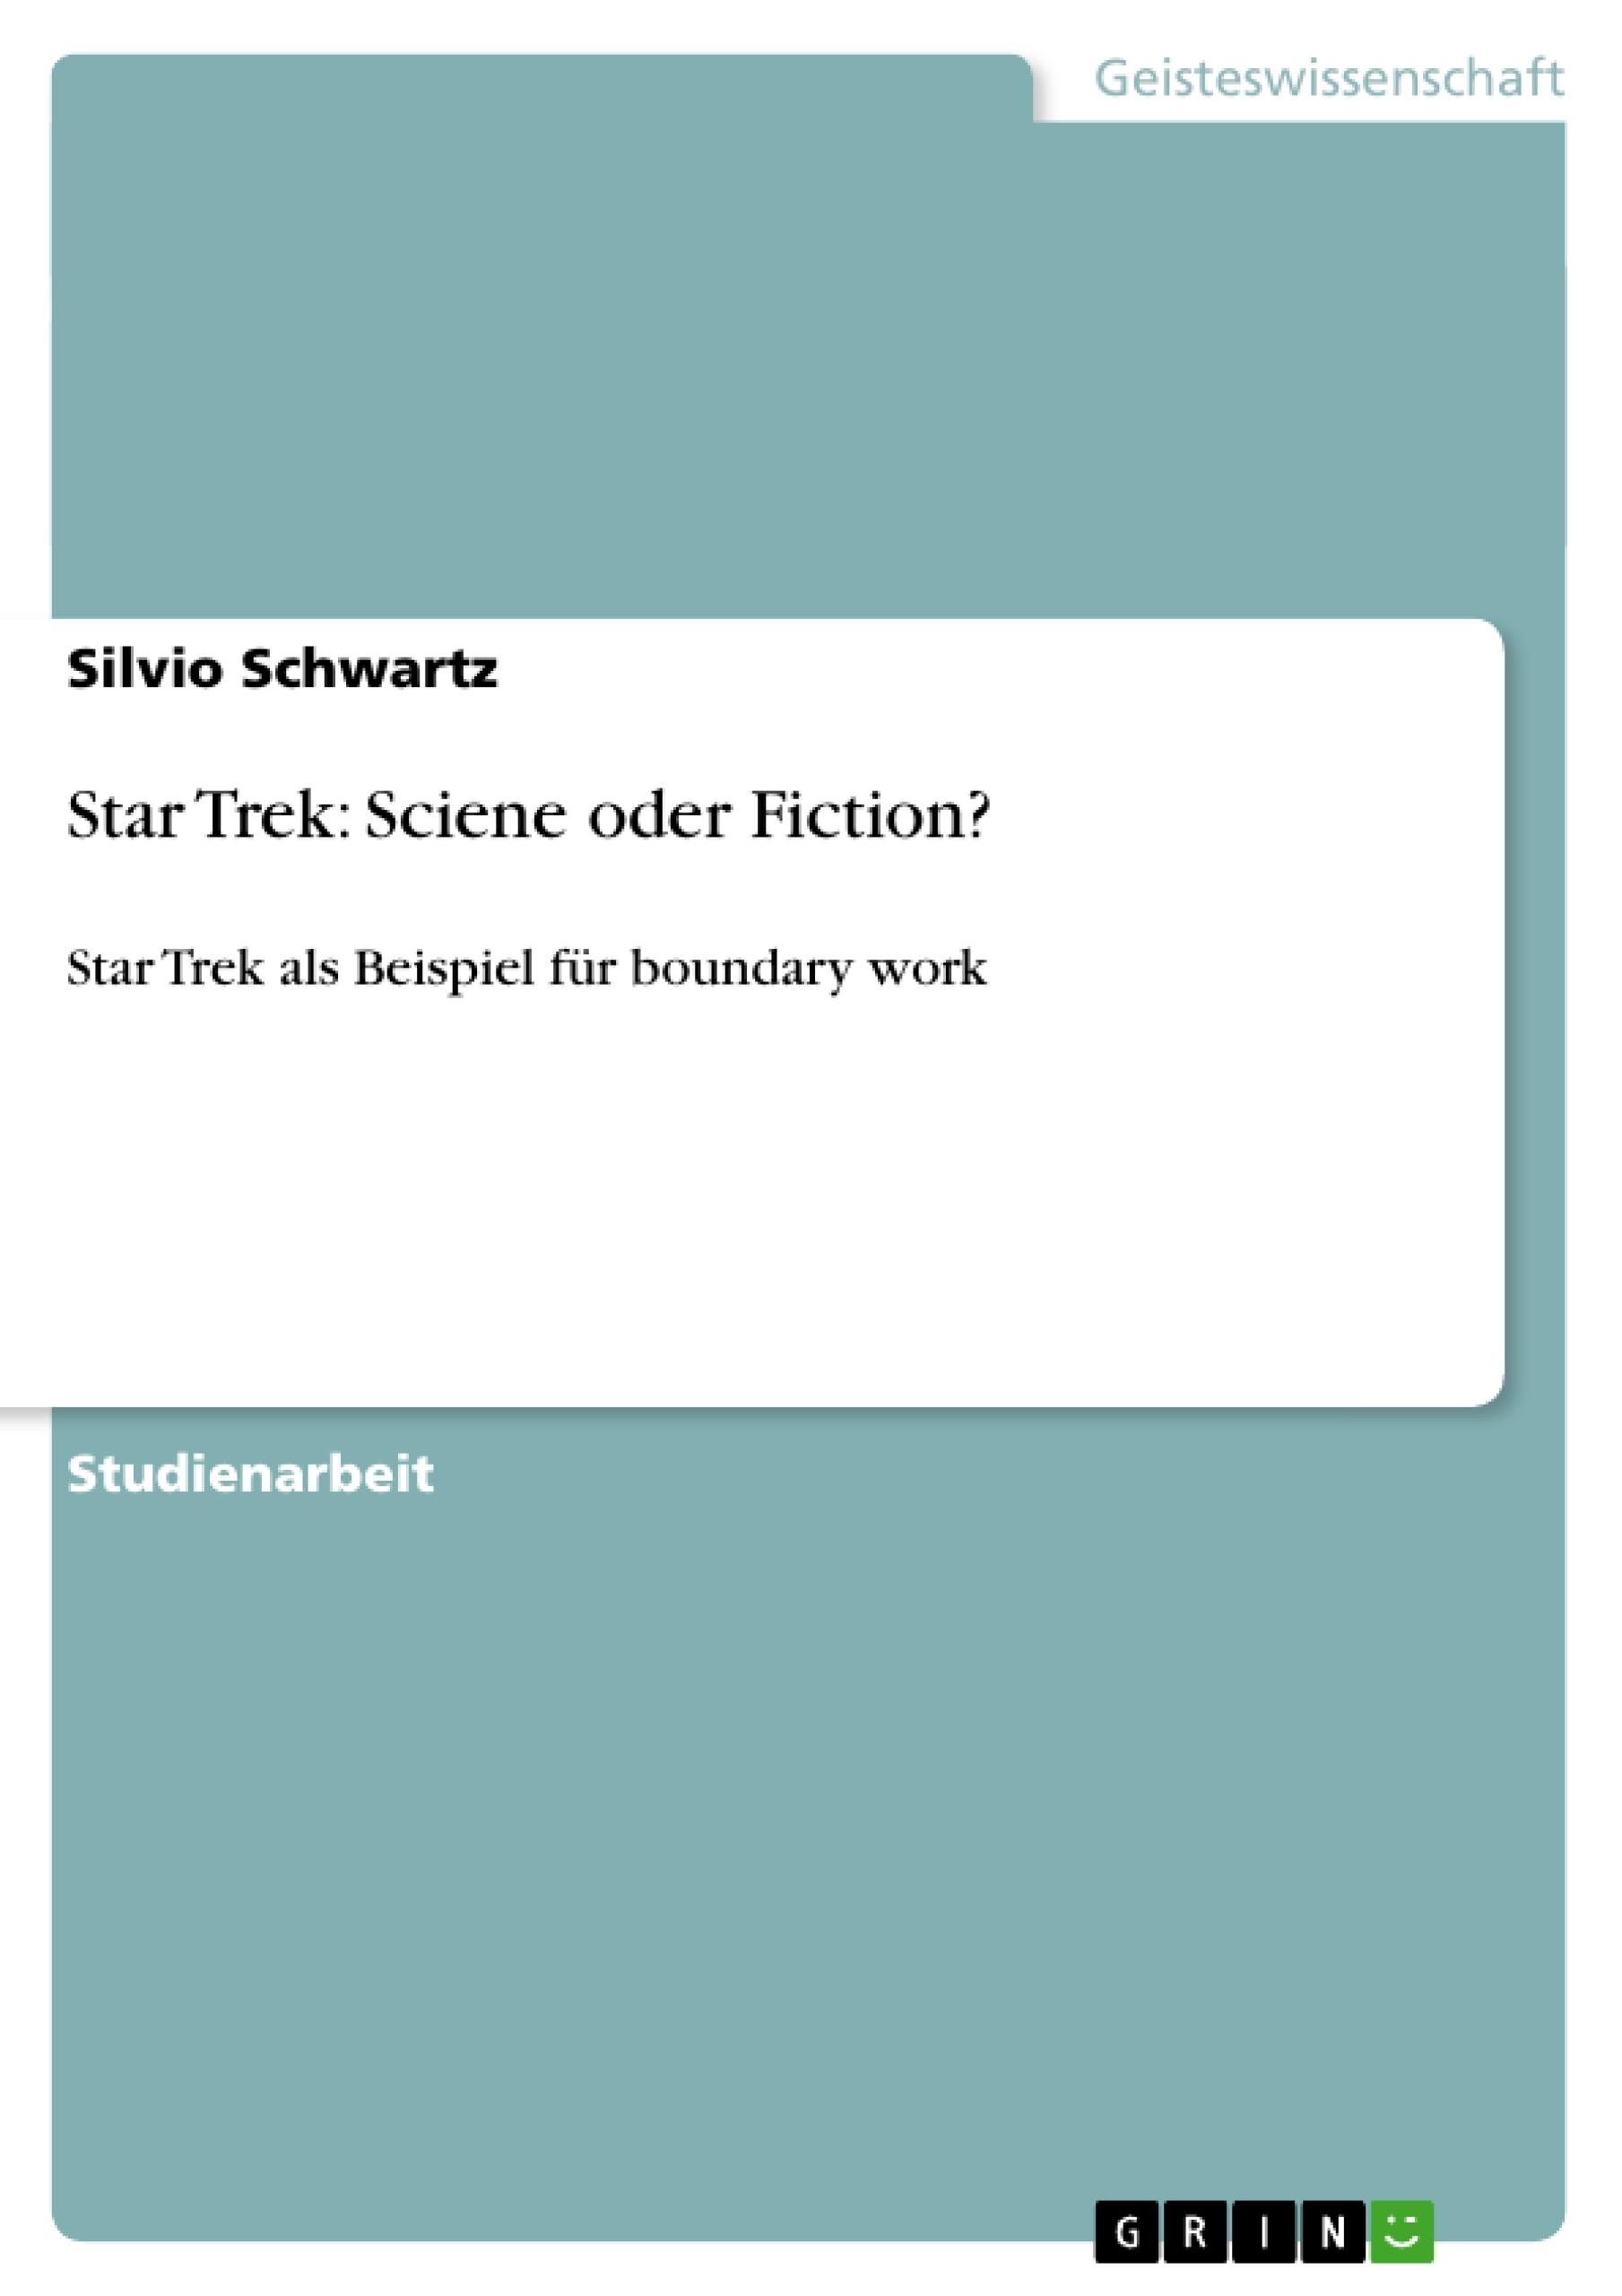 Titel: Star Trek: Sciene oder Fiction?